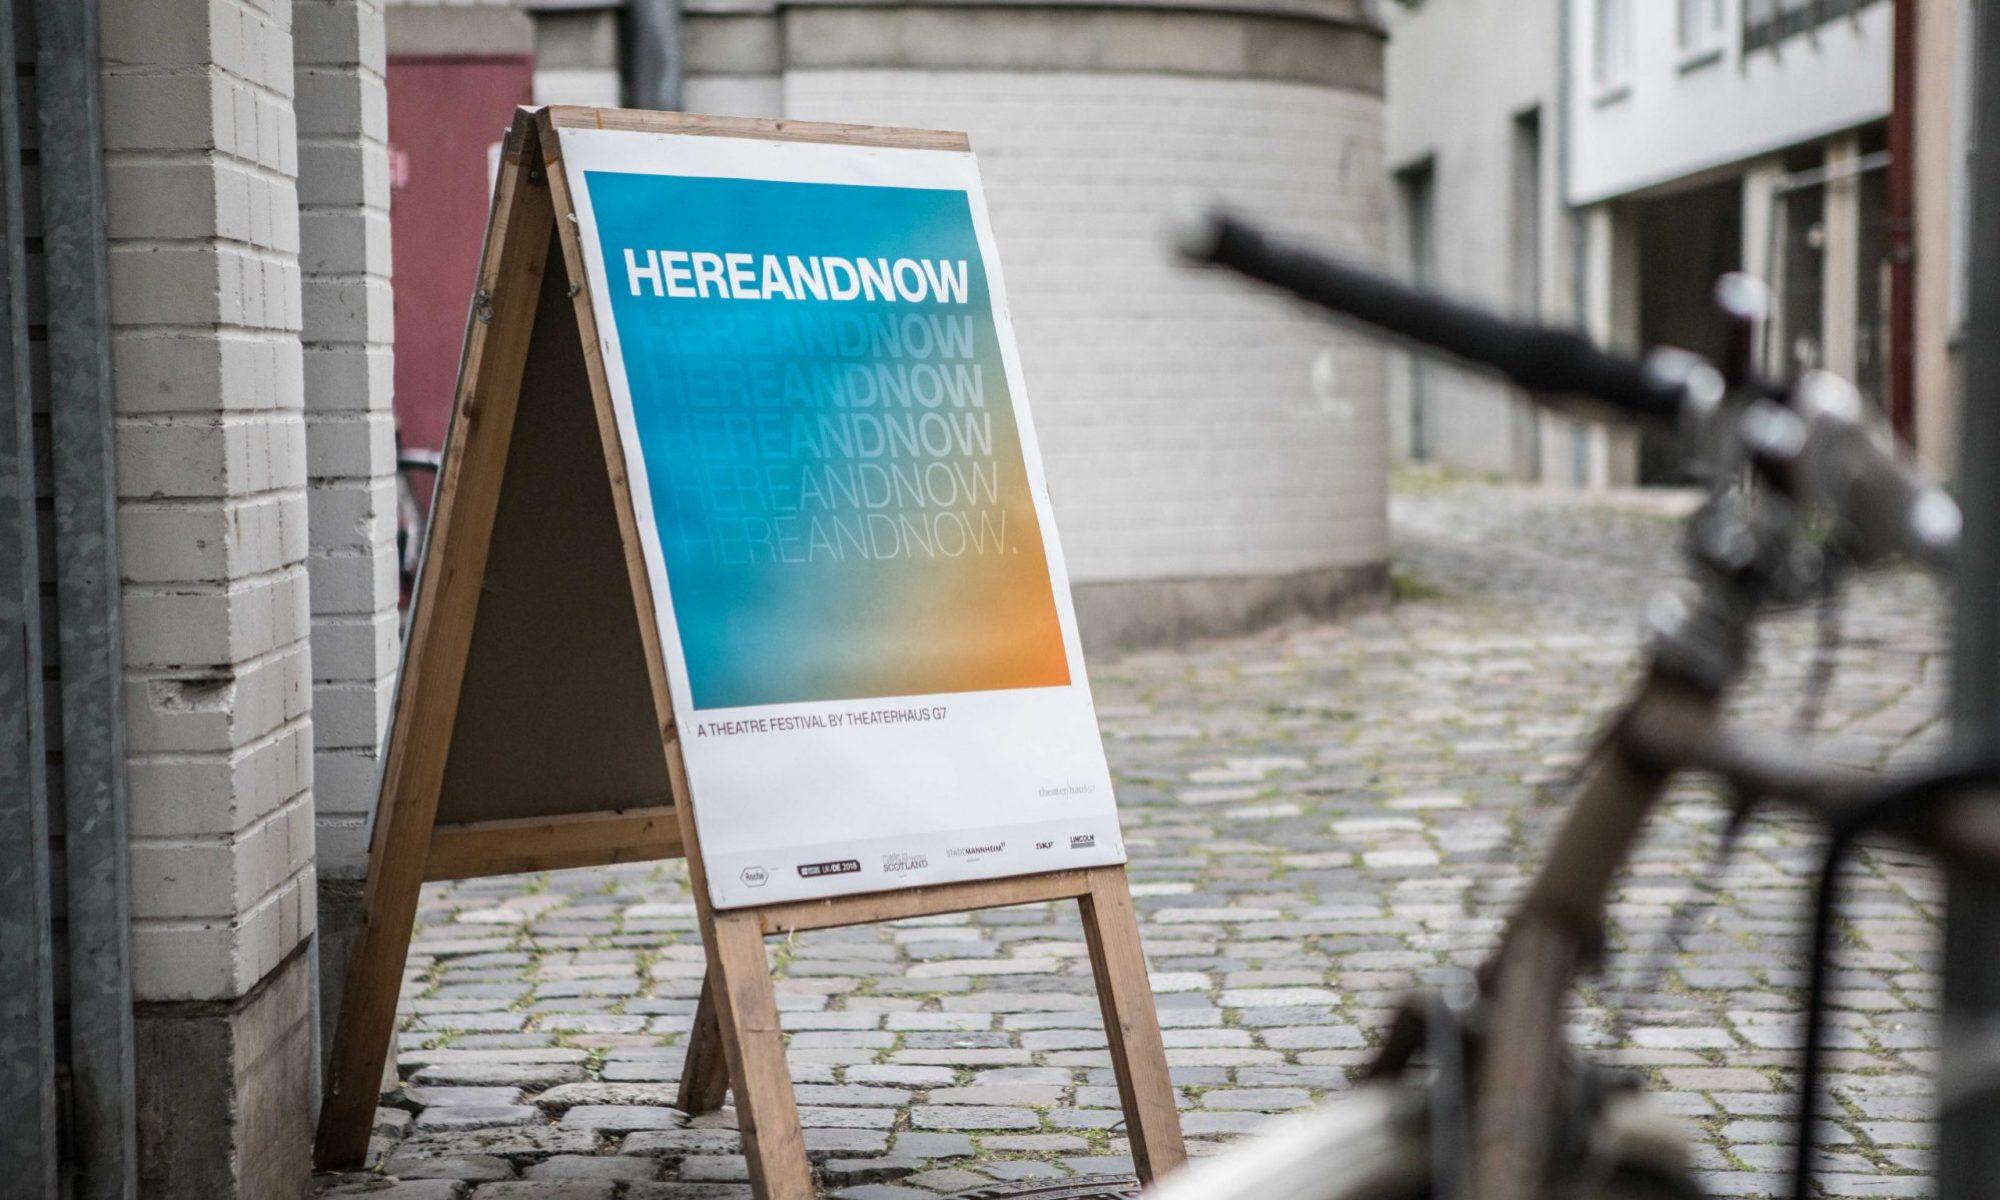 HEREANDNOW